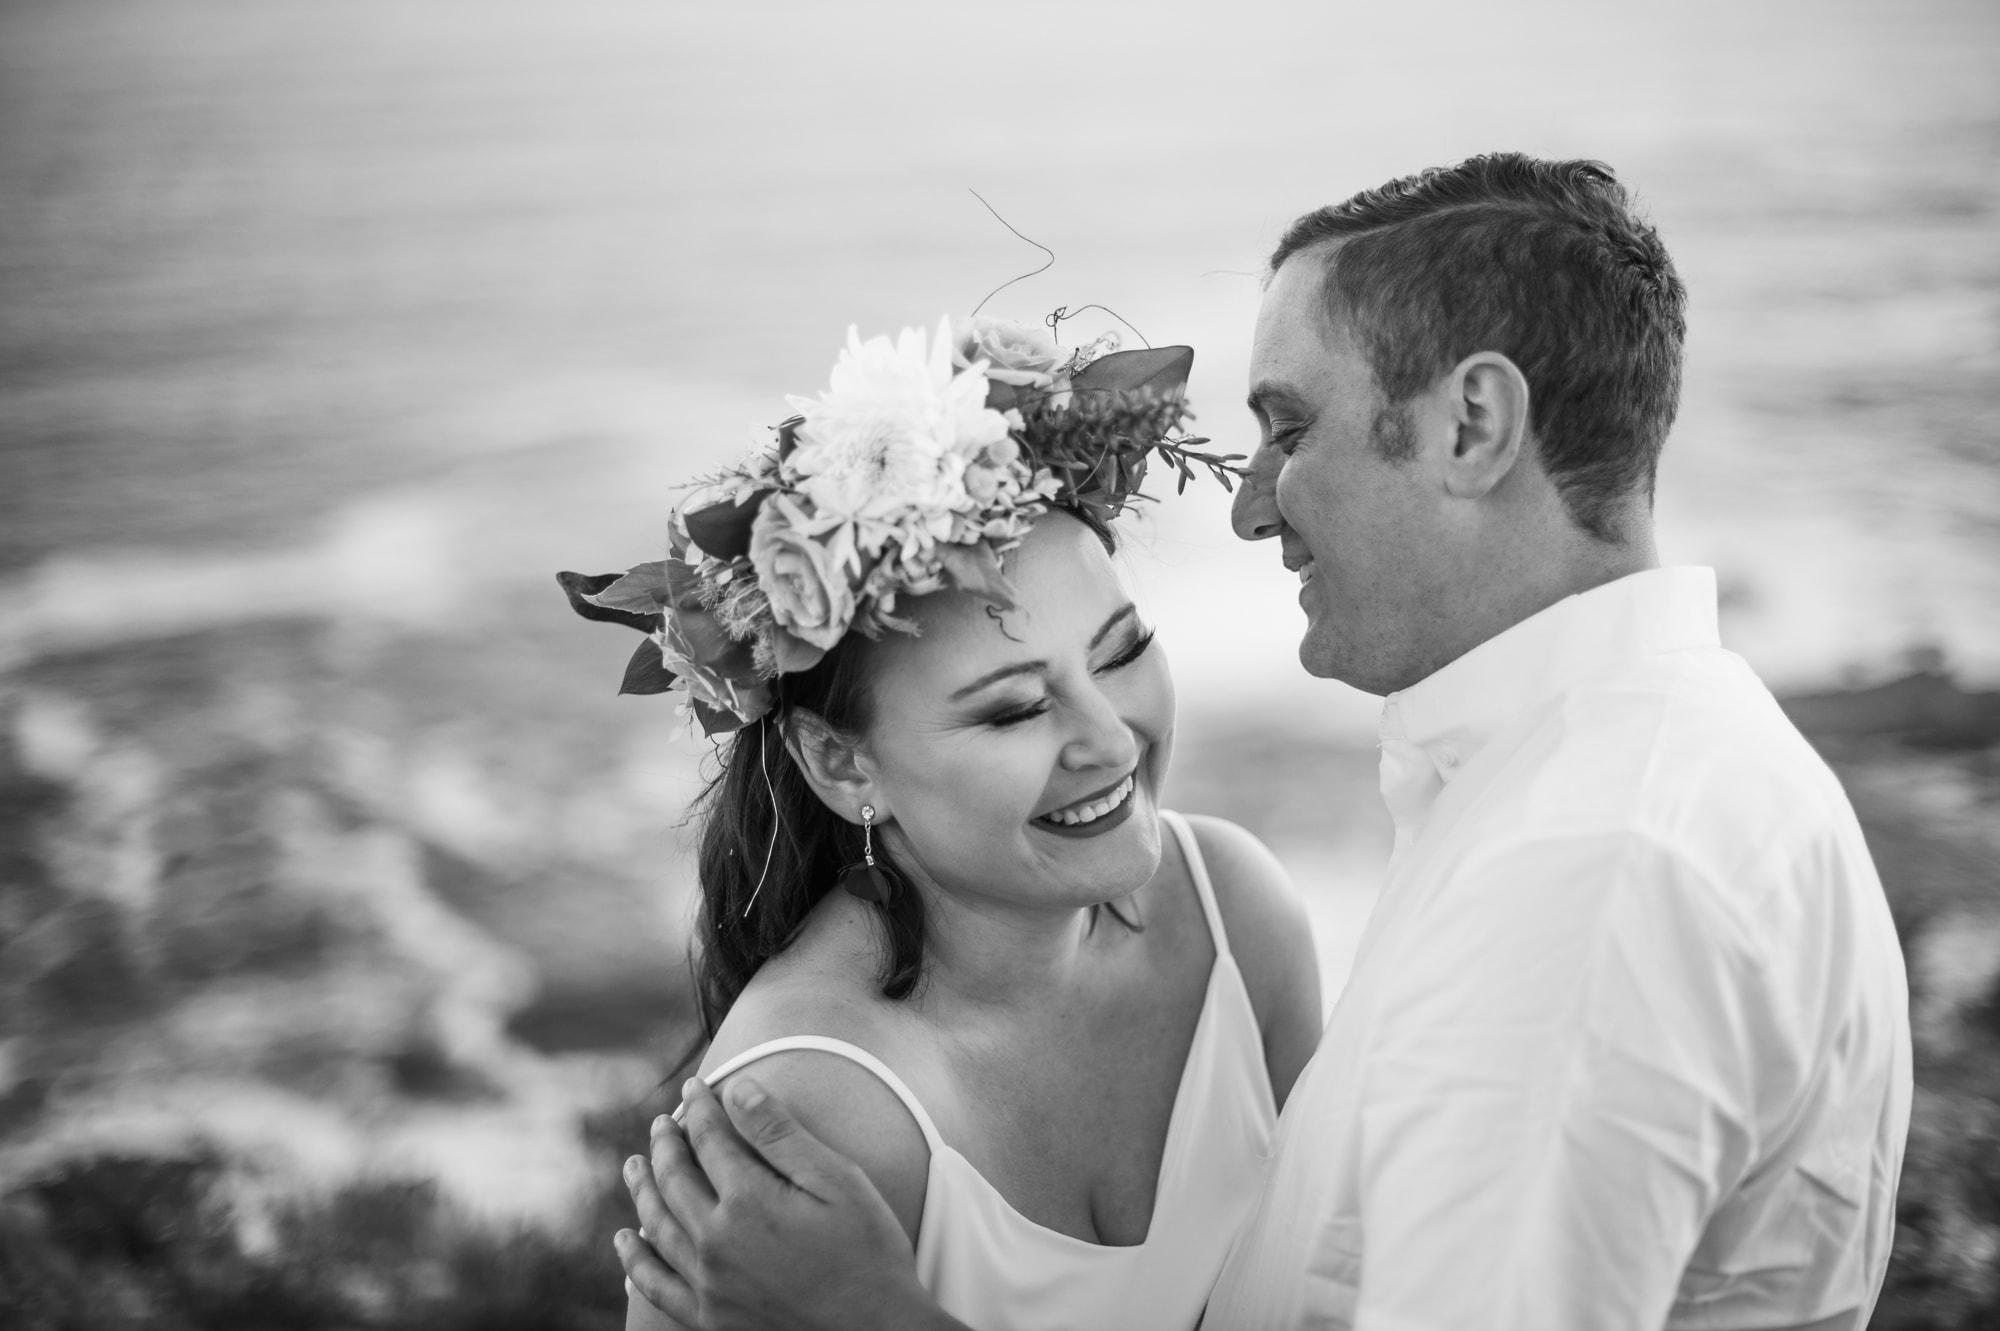 jesann-freddie-kranshoek-engagement-June-Richards-Photography-Destination-Weddings-Elopements-Garden-Route-30